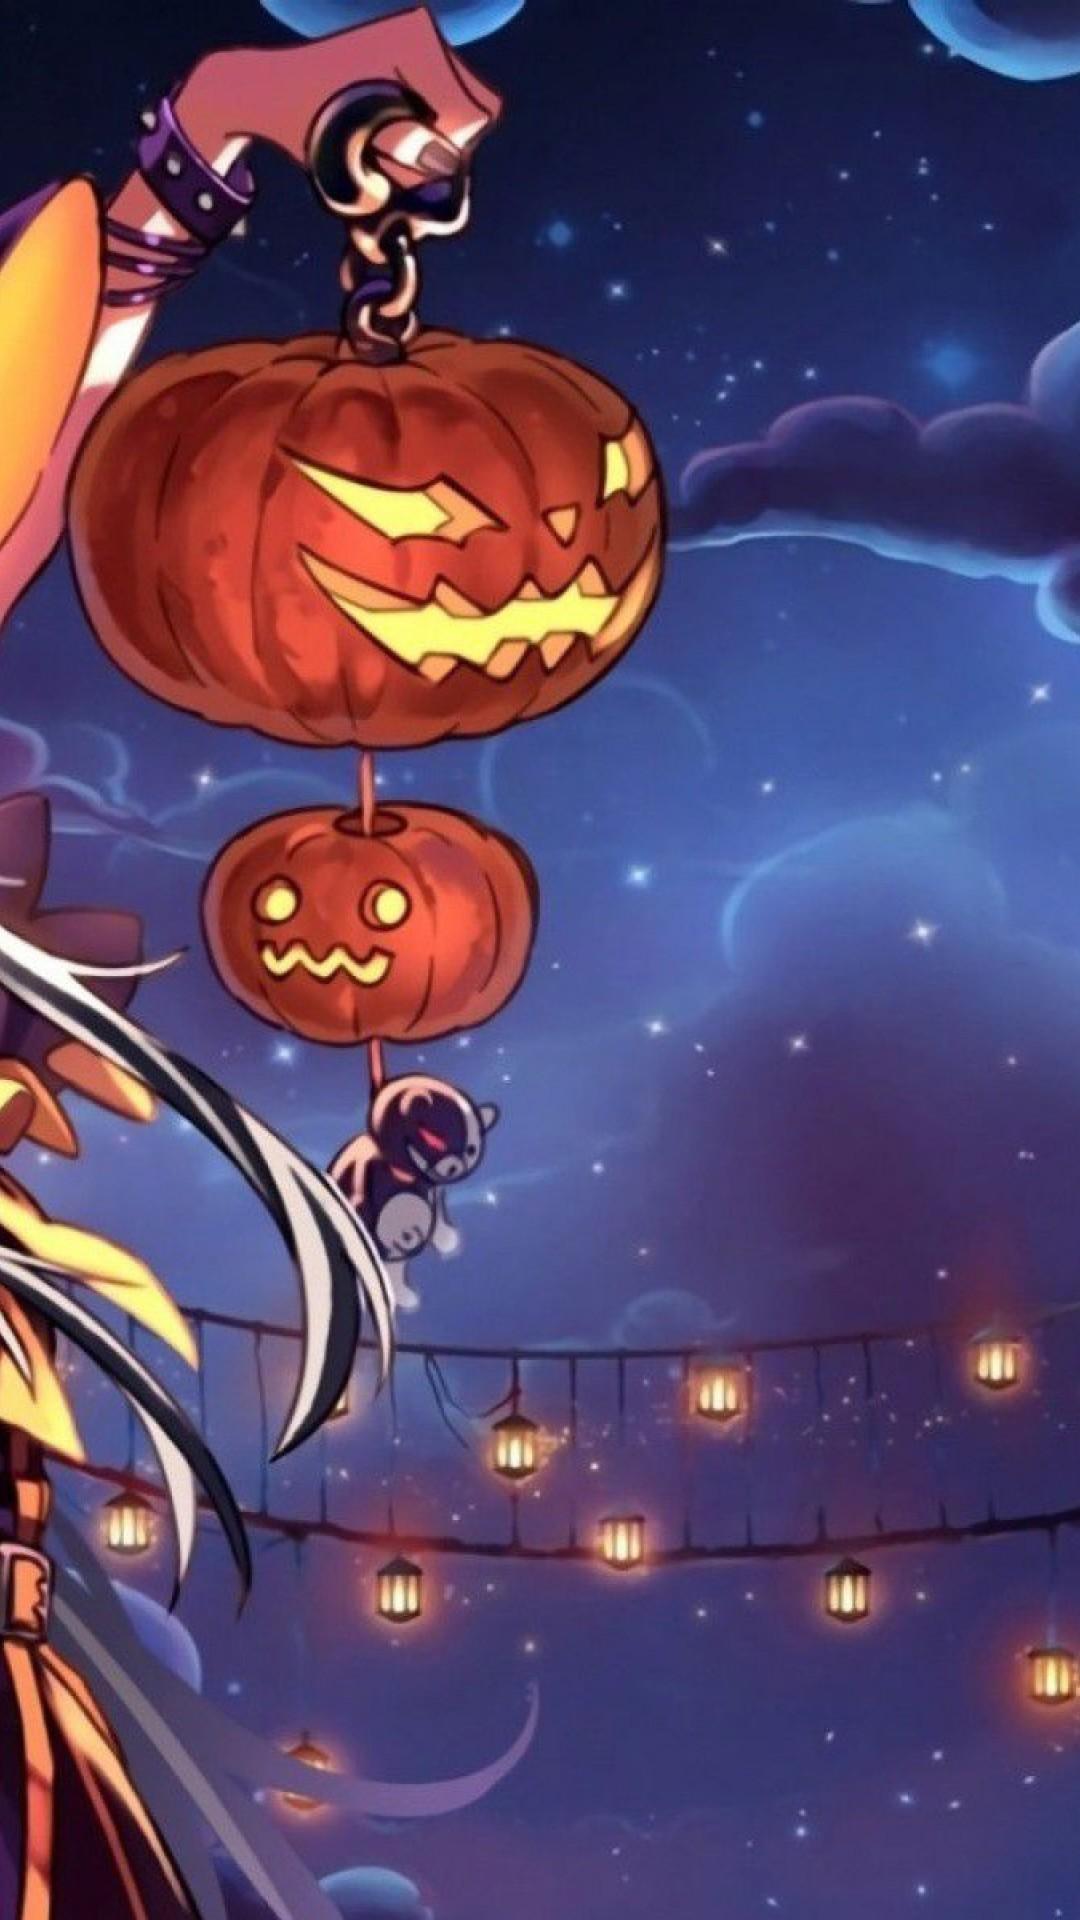 Smart Girl Wallpaper Download Halloween Anime Wallpaper 68 Images